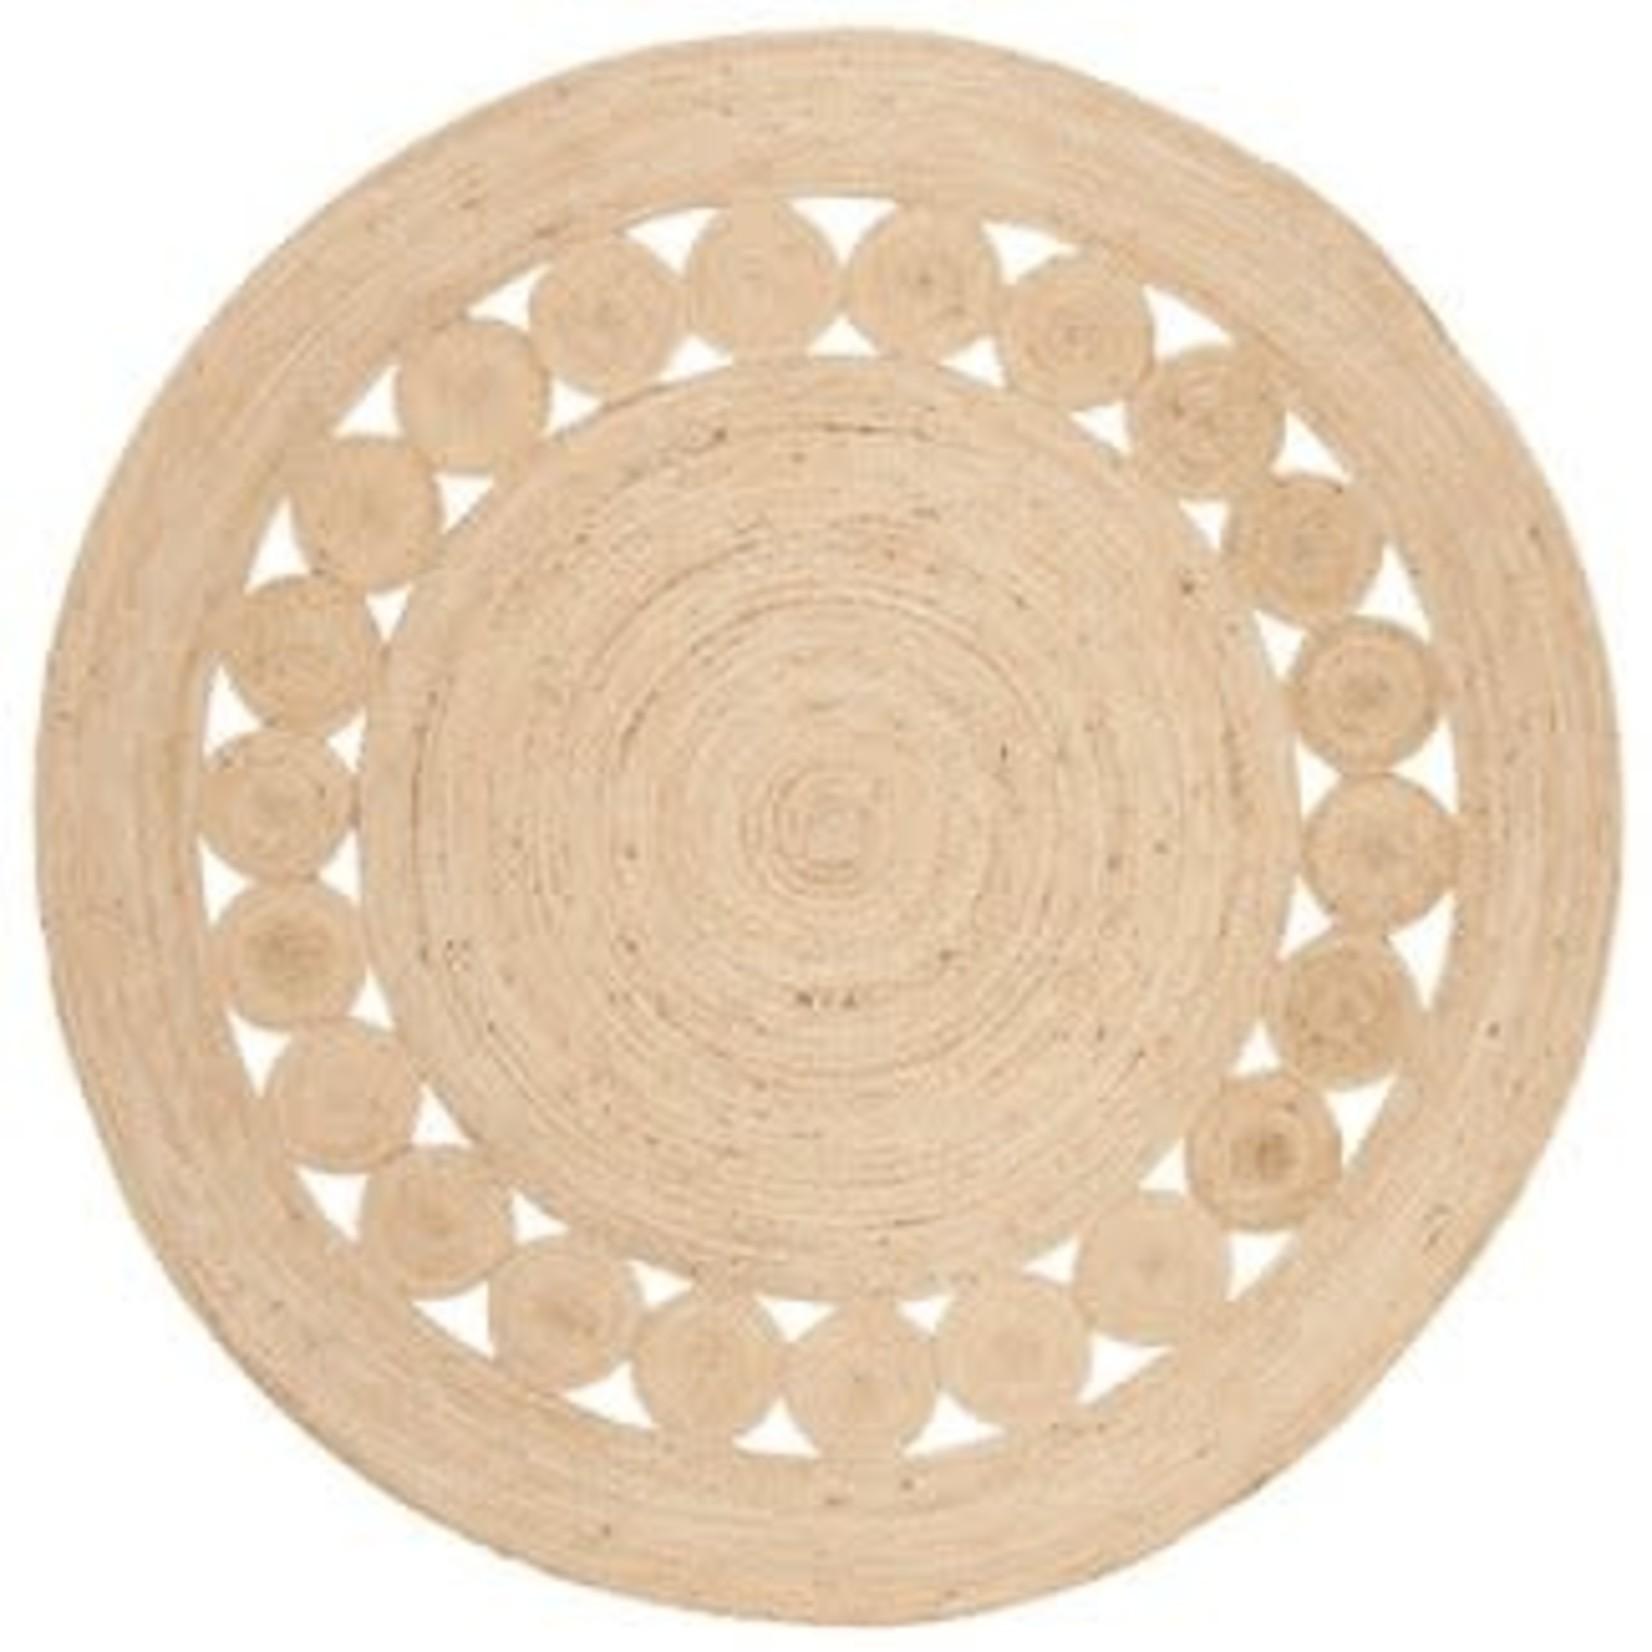 Noemi Solid Woven Round Rug - Safavieh 6'